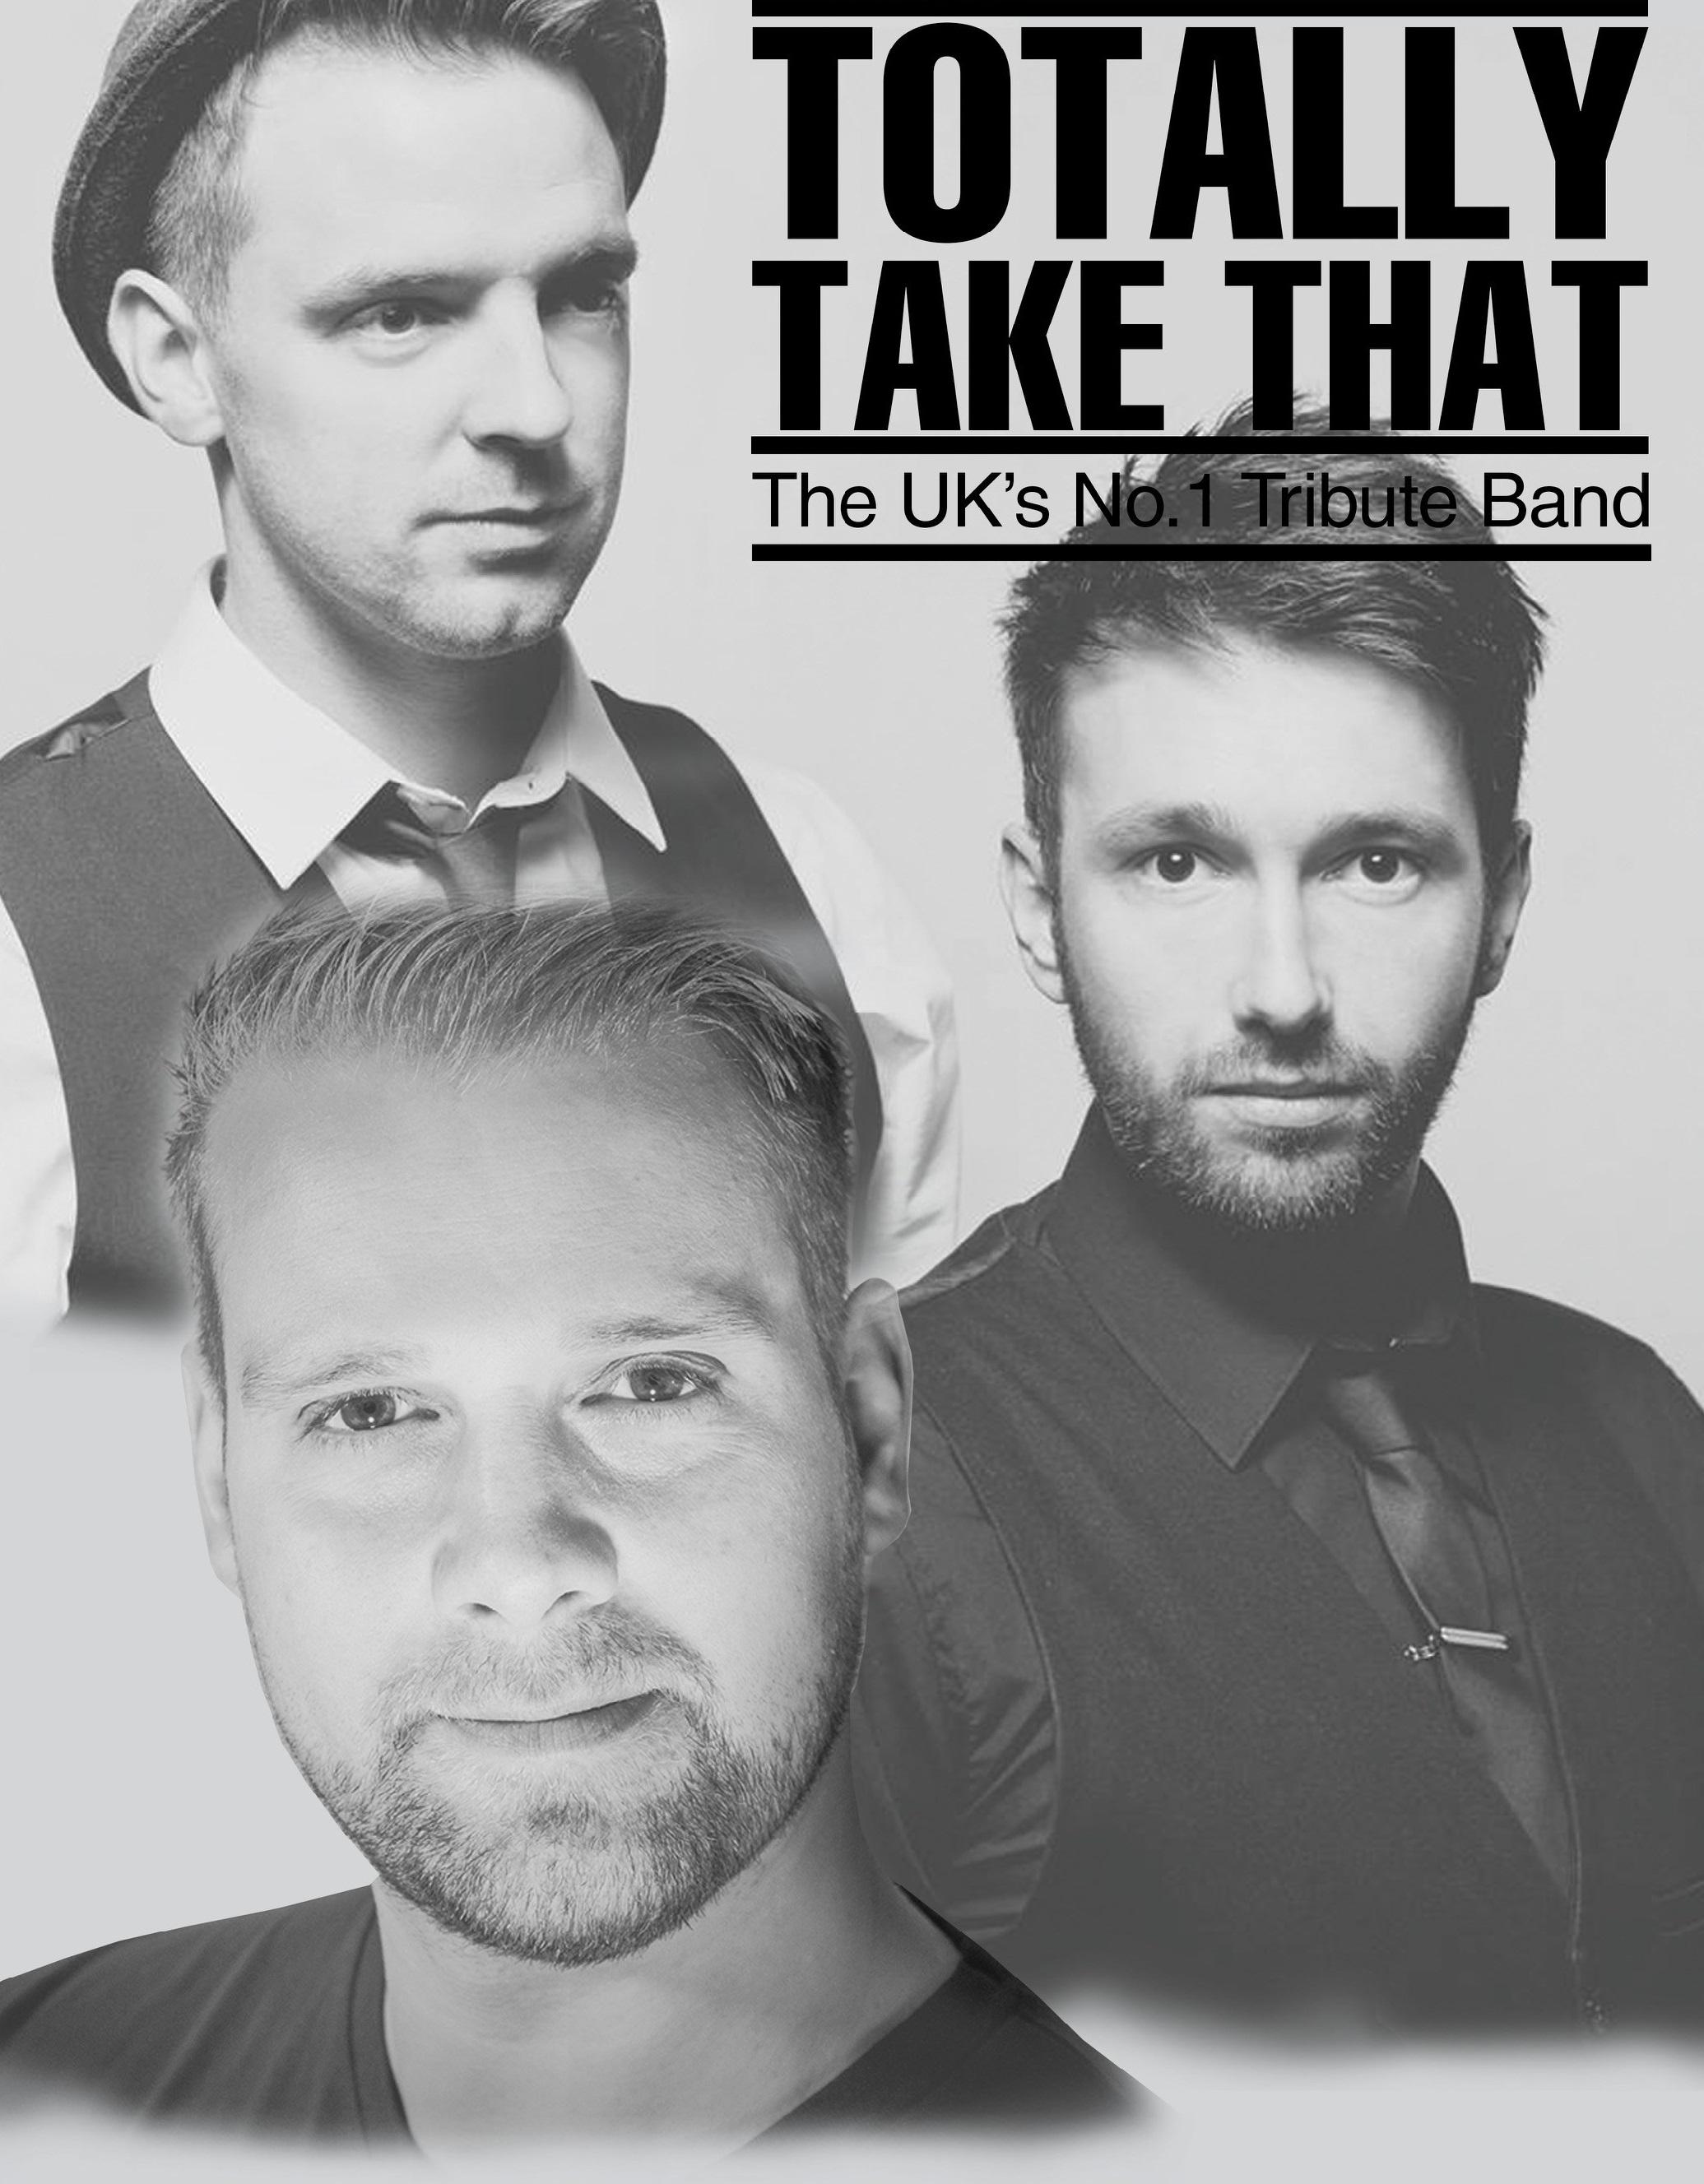 Take That Tribute Act - Totally Take That